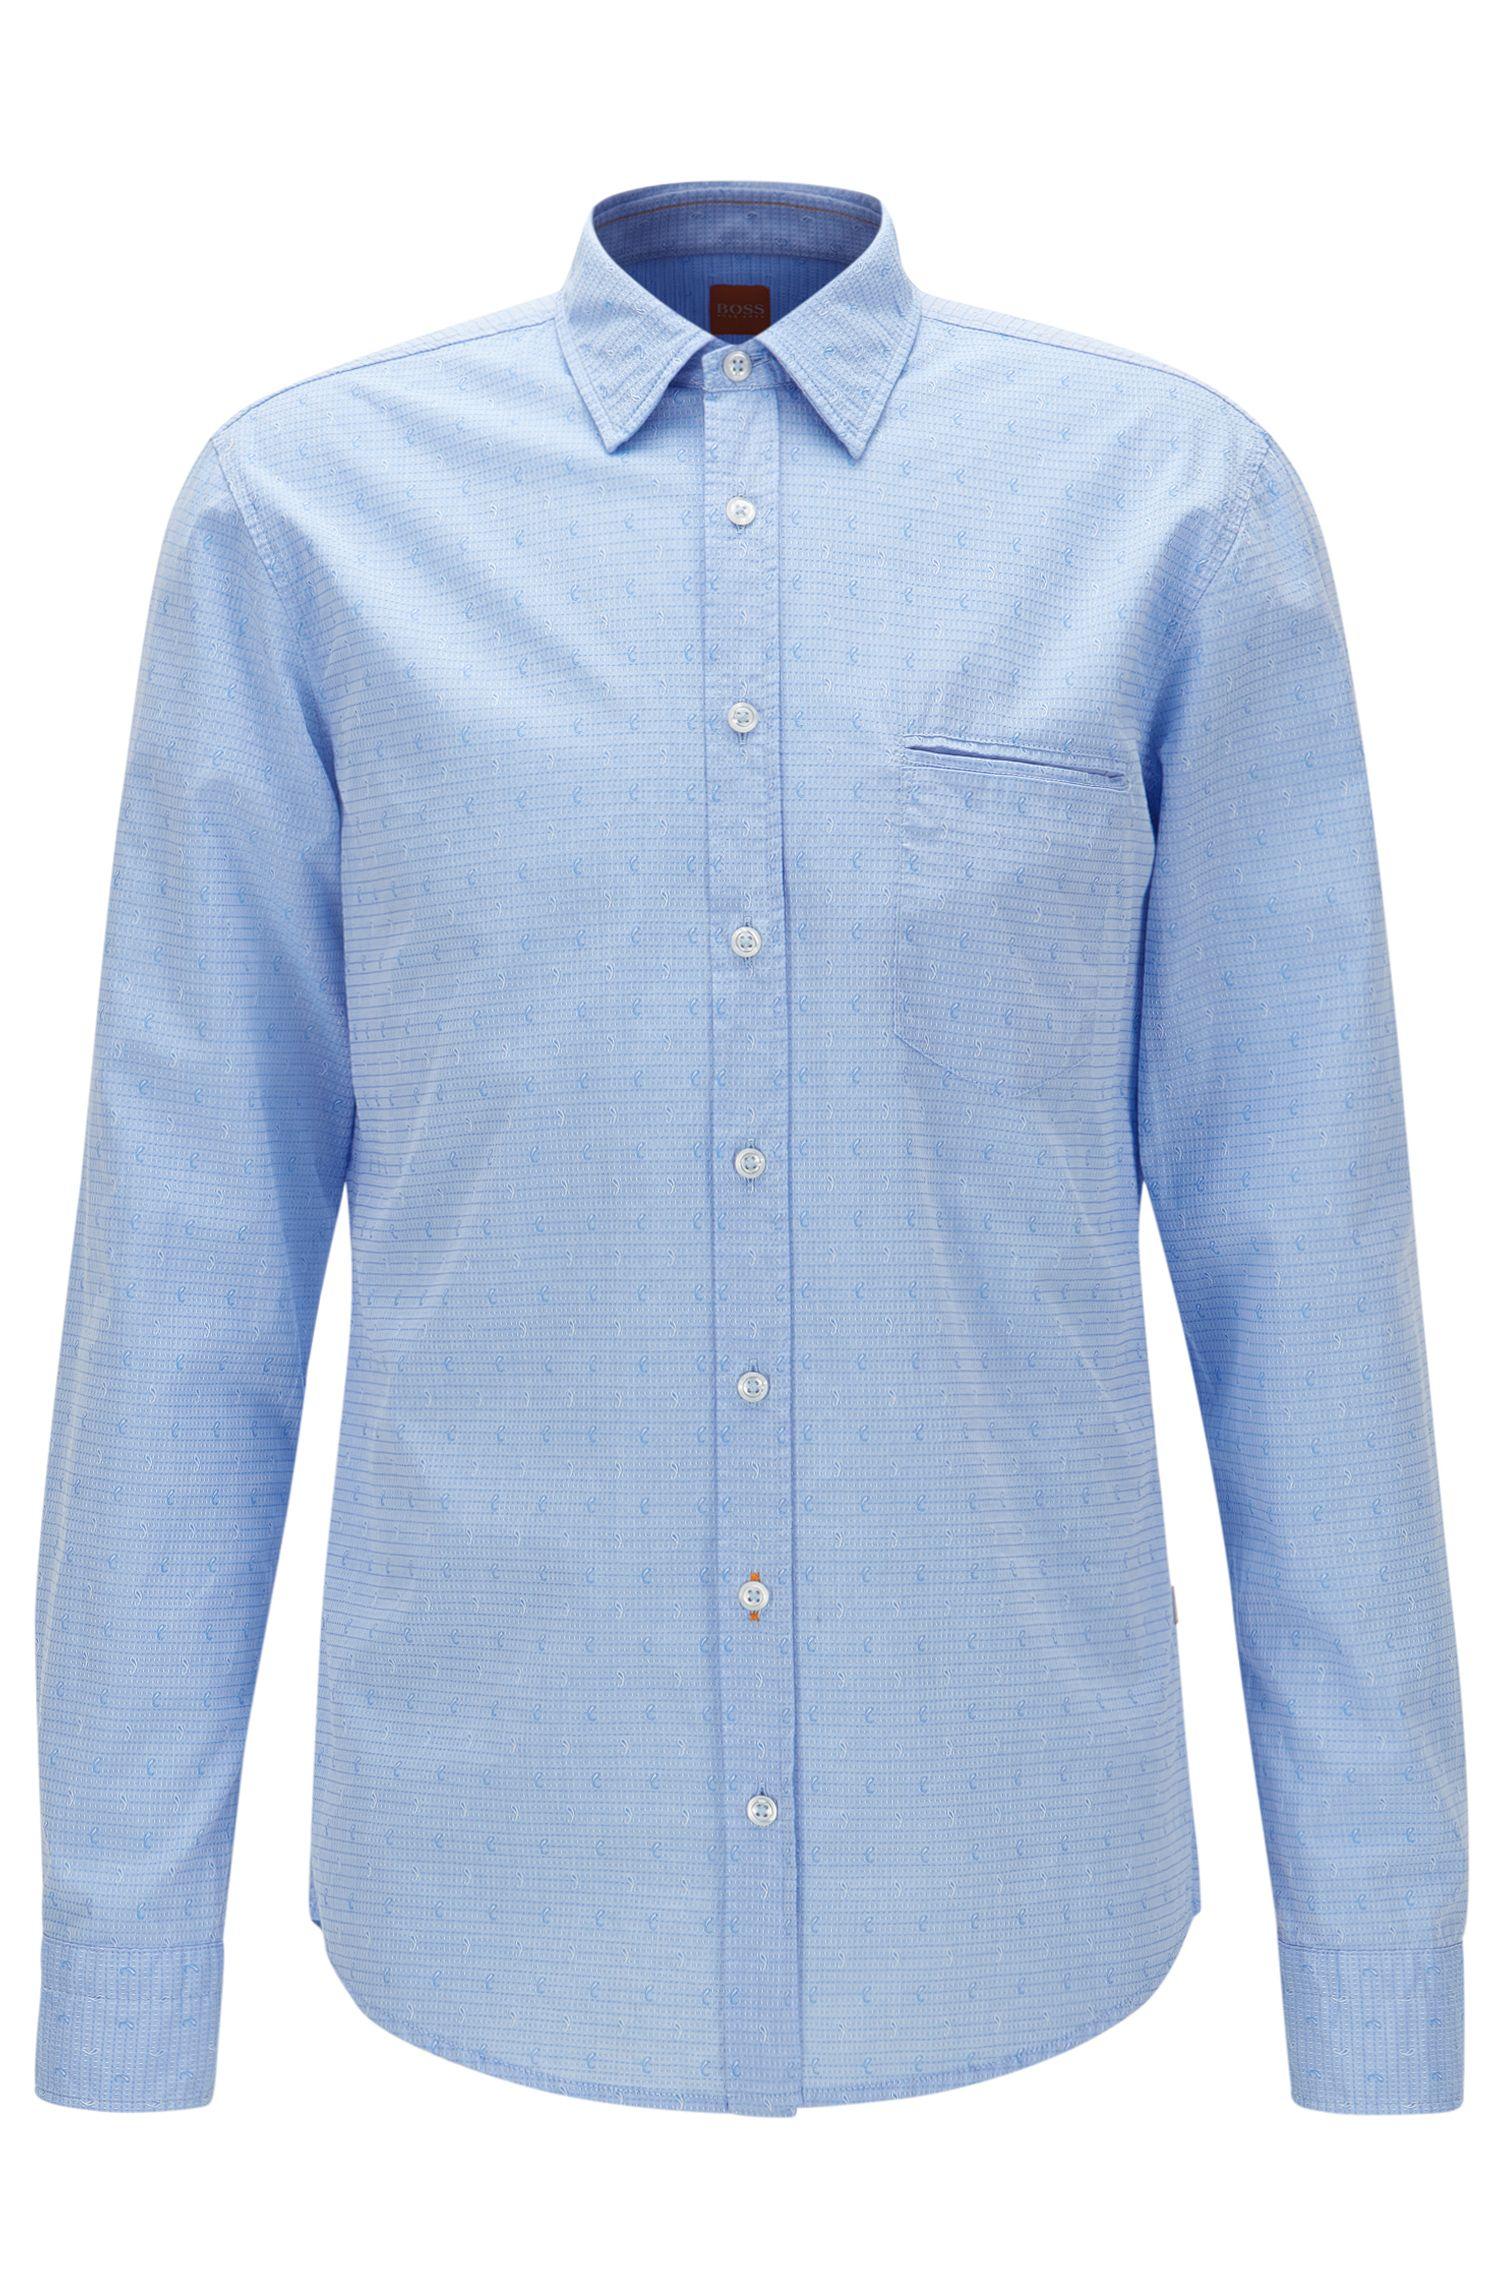 Paisley Cotton Button Down Shirt, Regular Fit | Classy